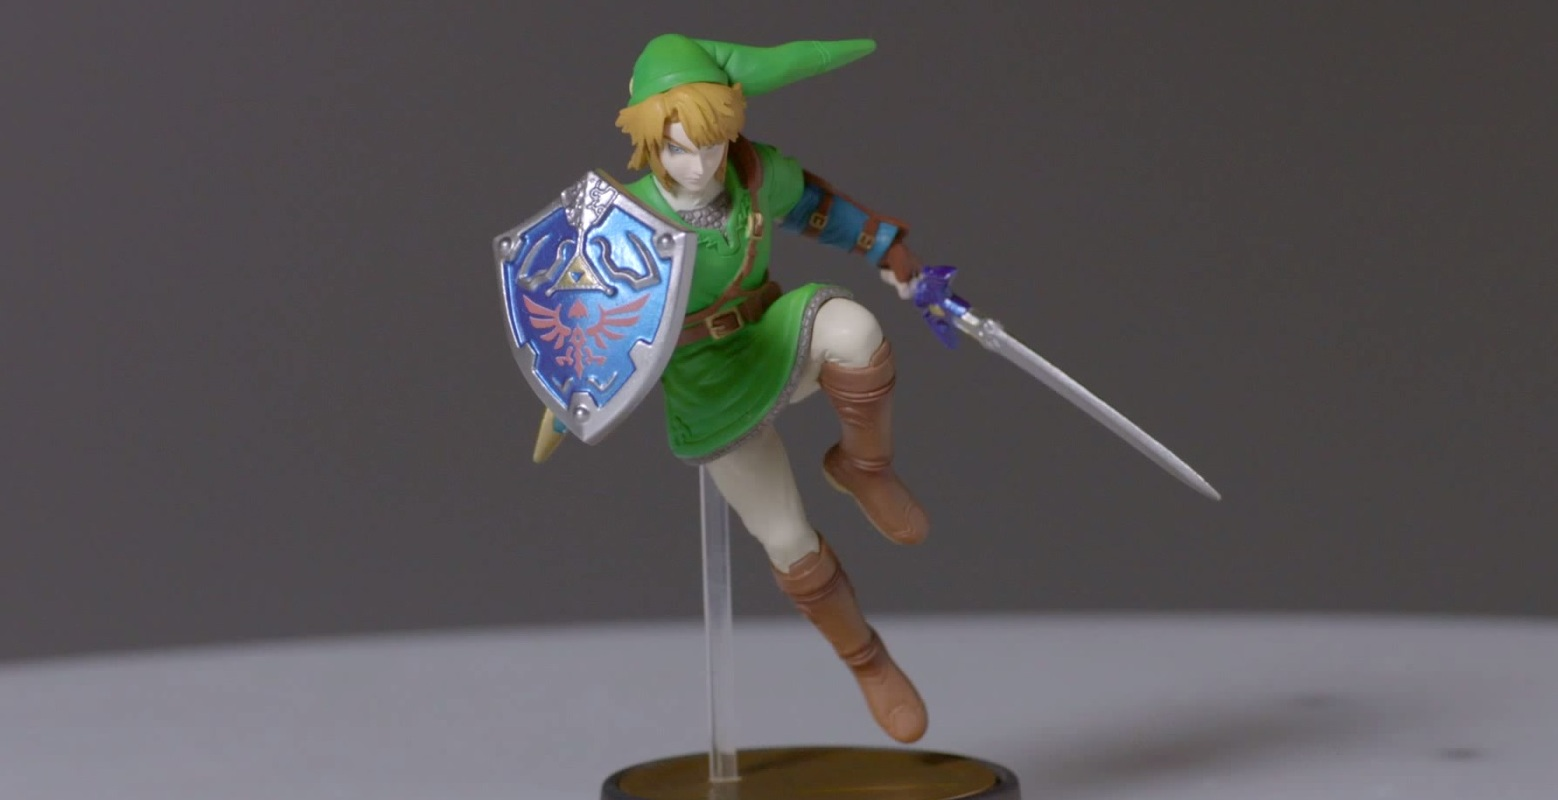 Link Amiibo Green Tunic